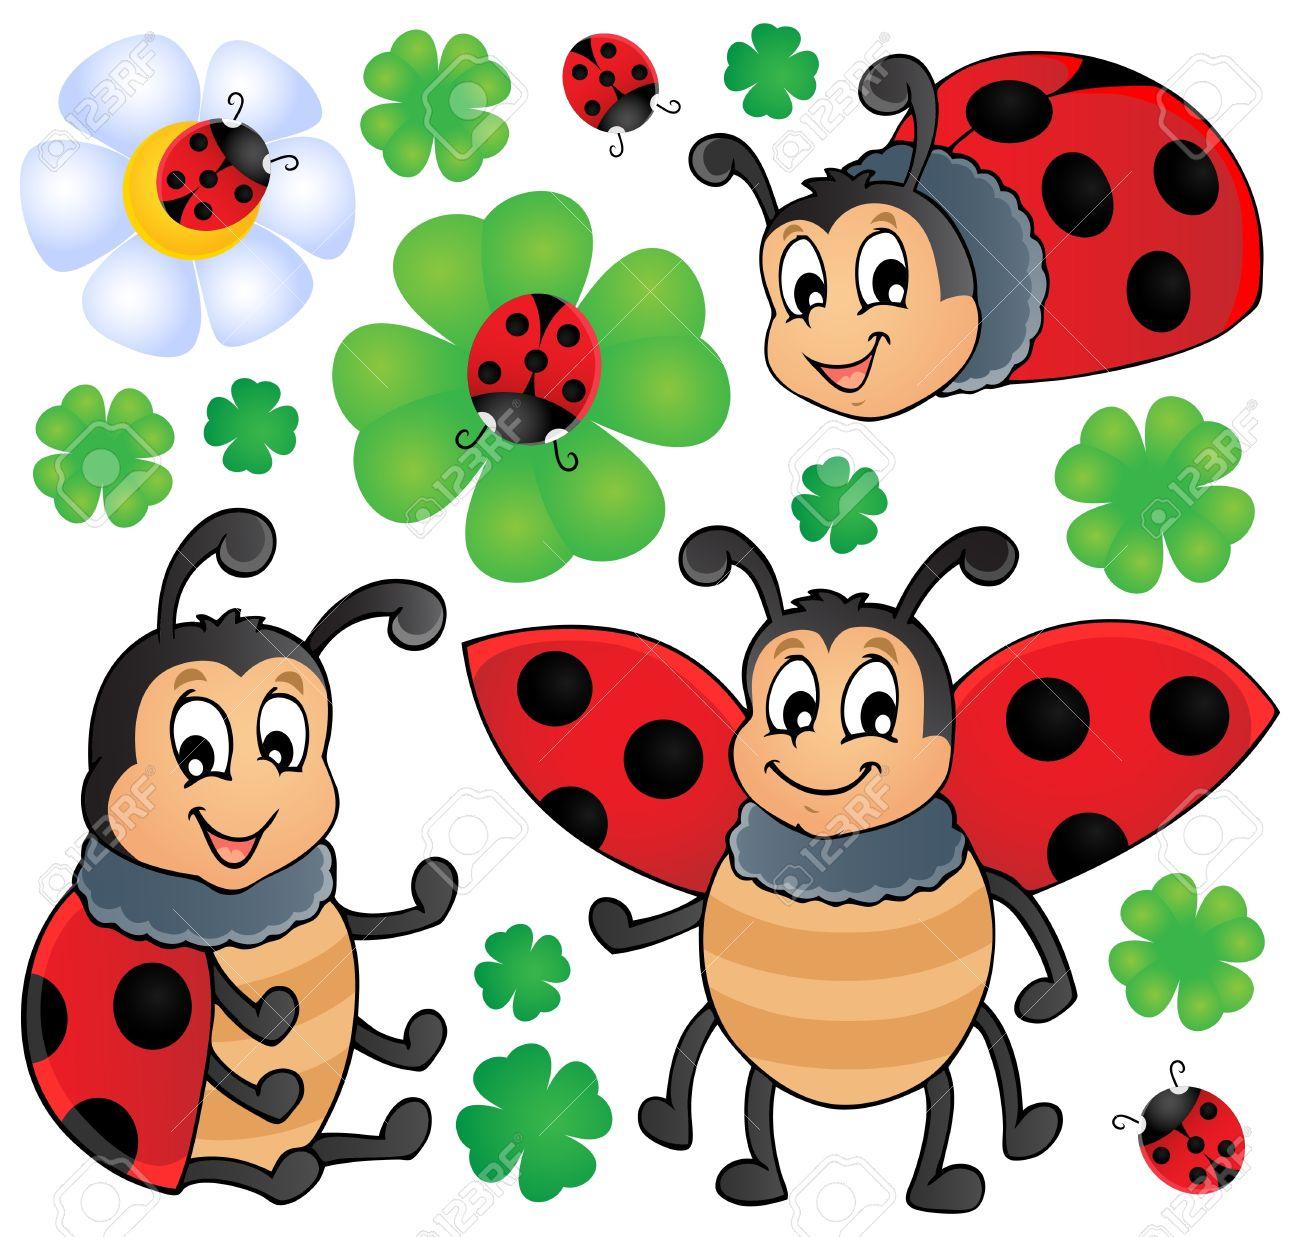 Image with ladybug theme 1 - vector illustration - 17368270